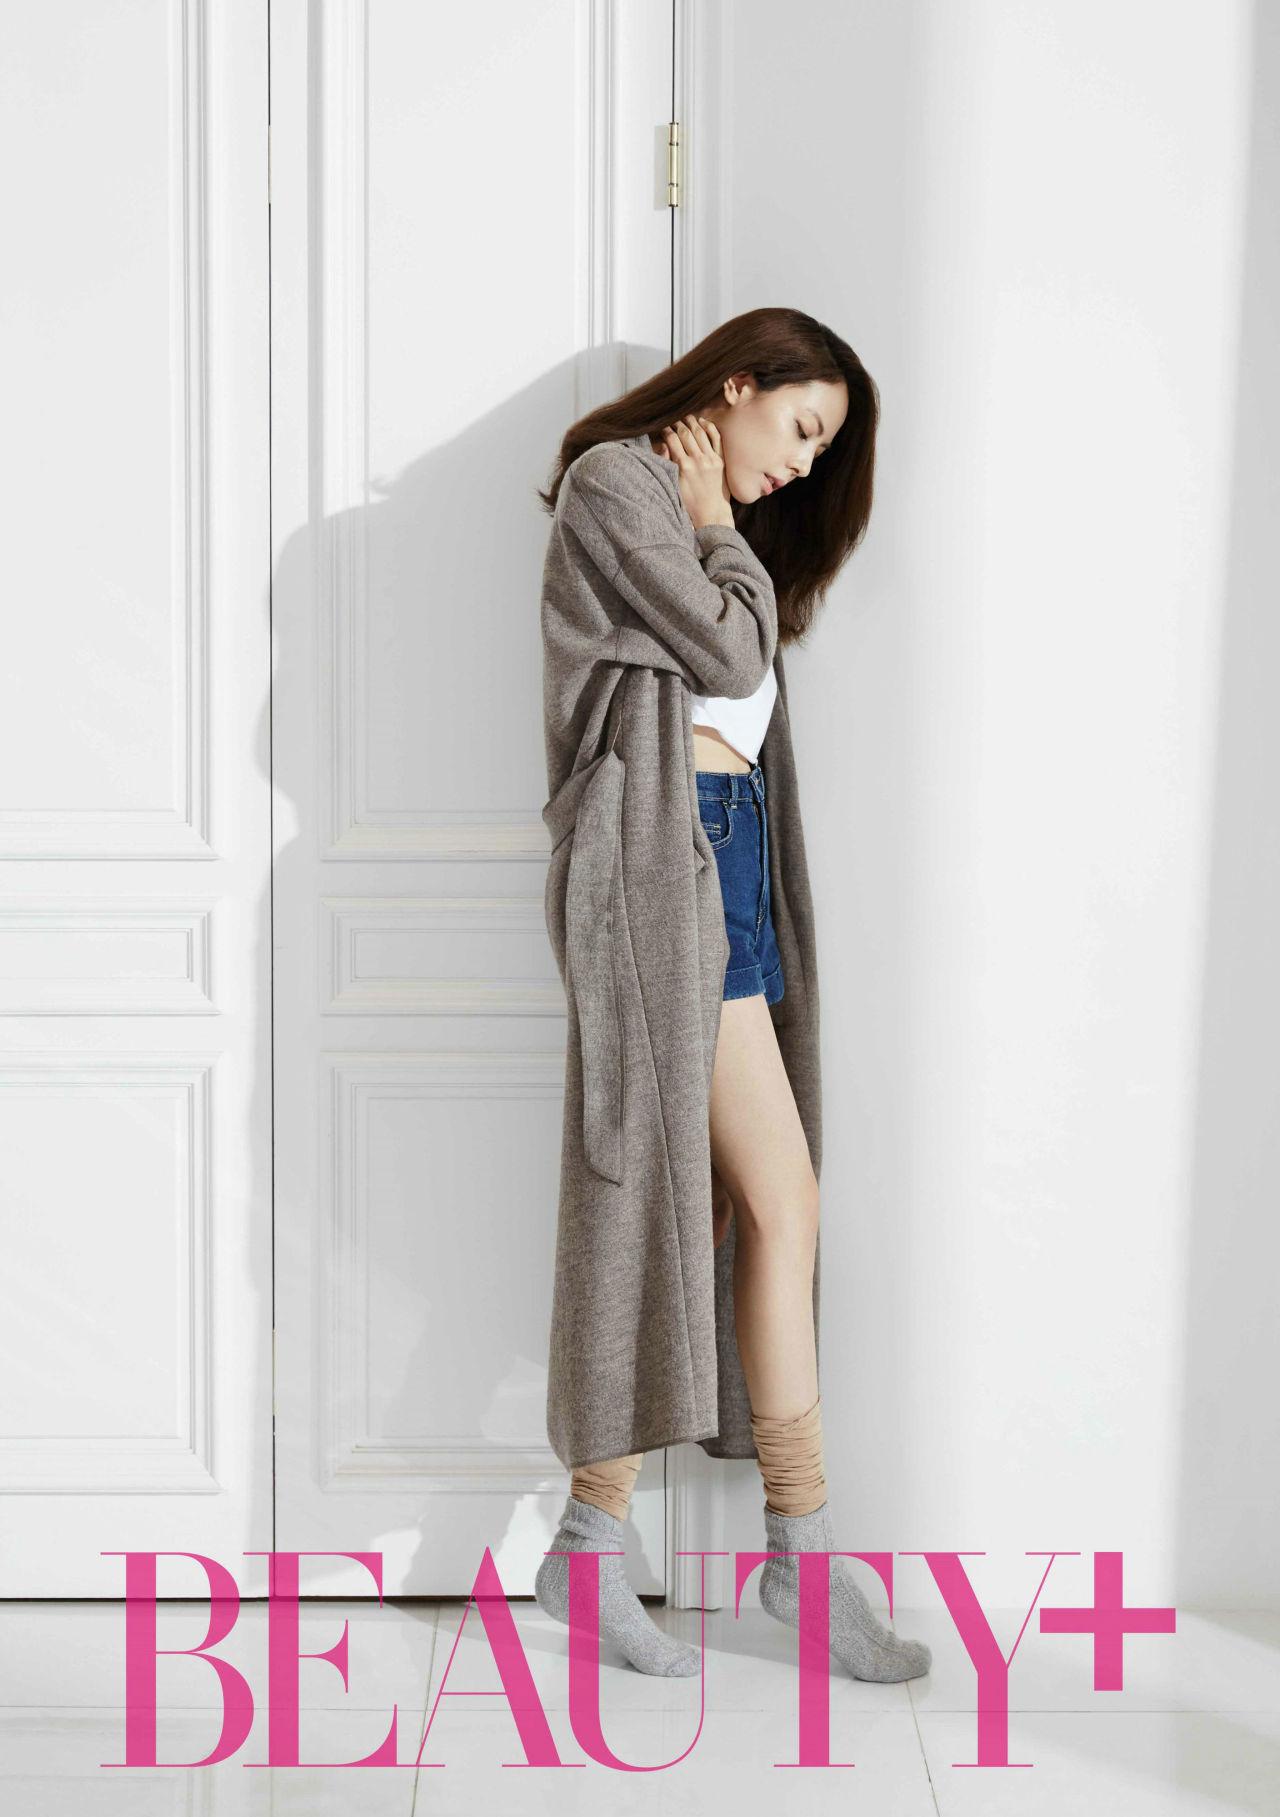 Park Ji Yoon - Beauty+ Magazine March Issue '15